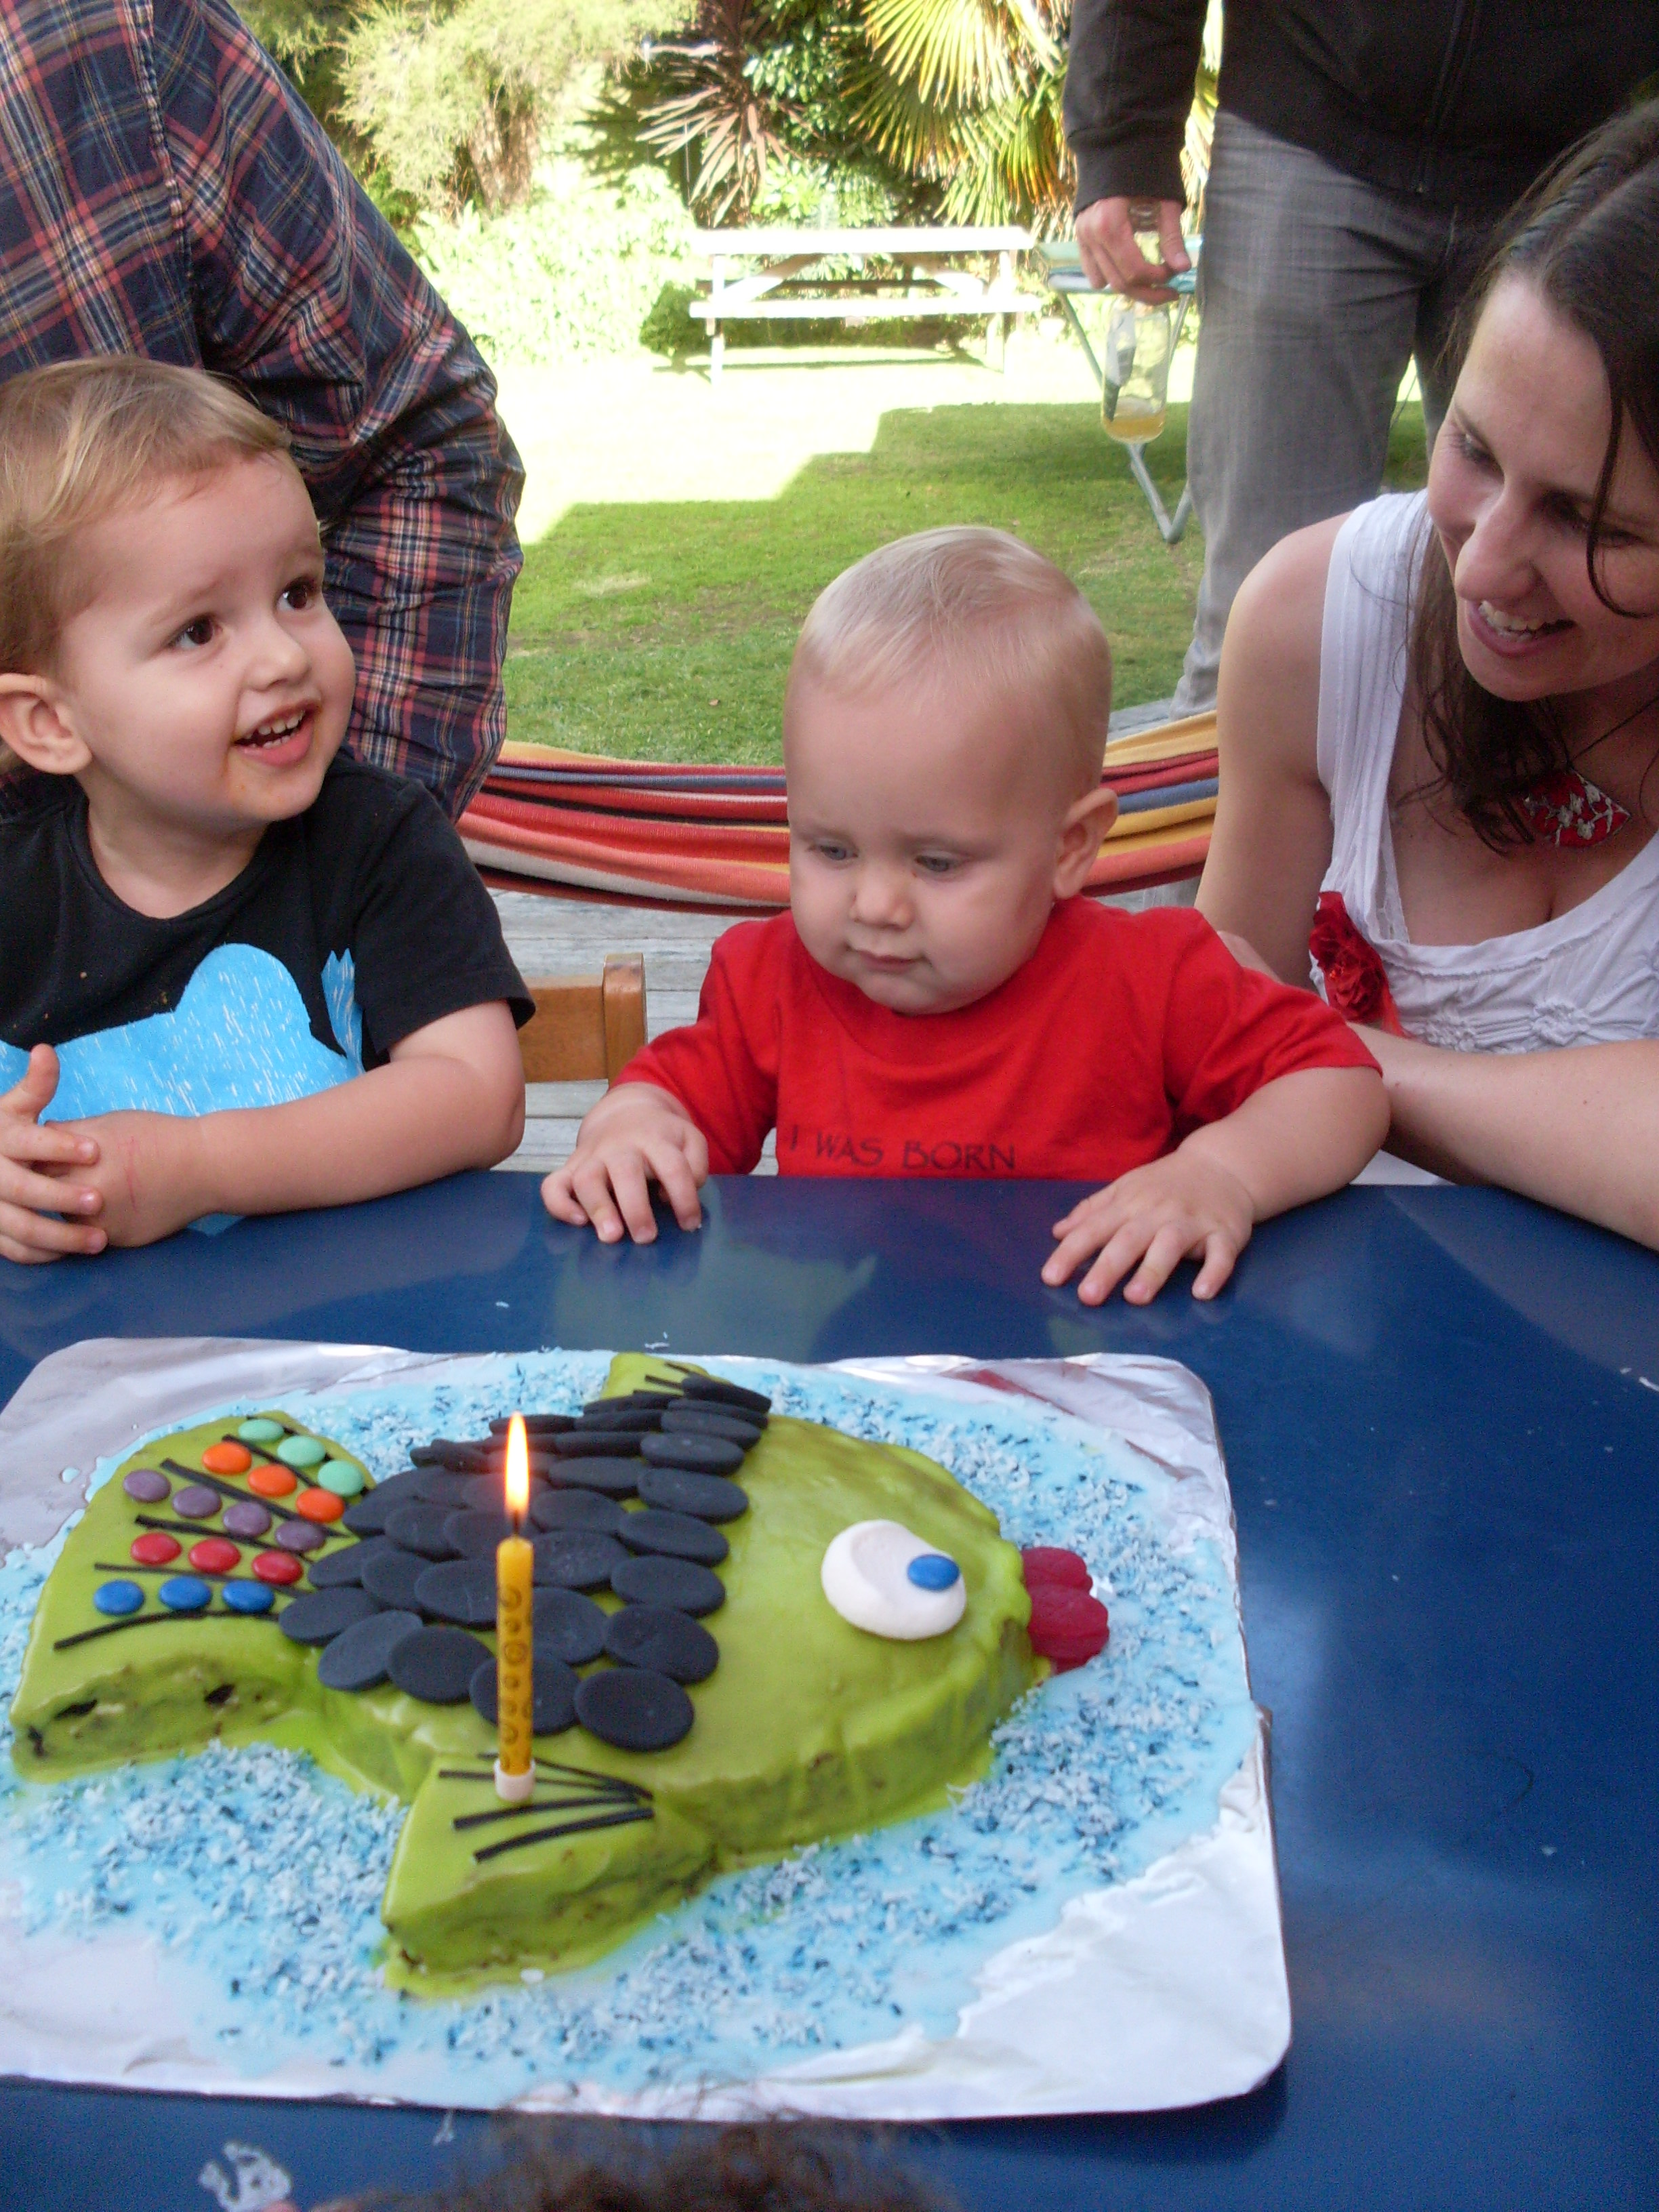 Jonah's 1st birthday